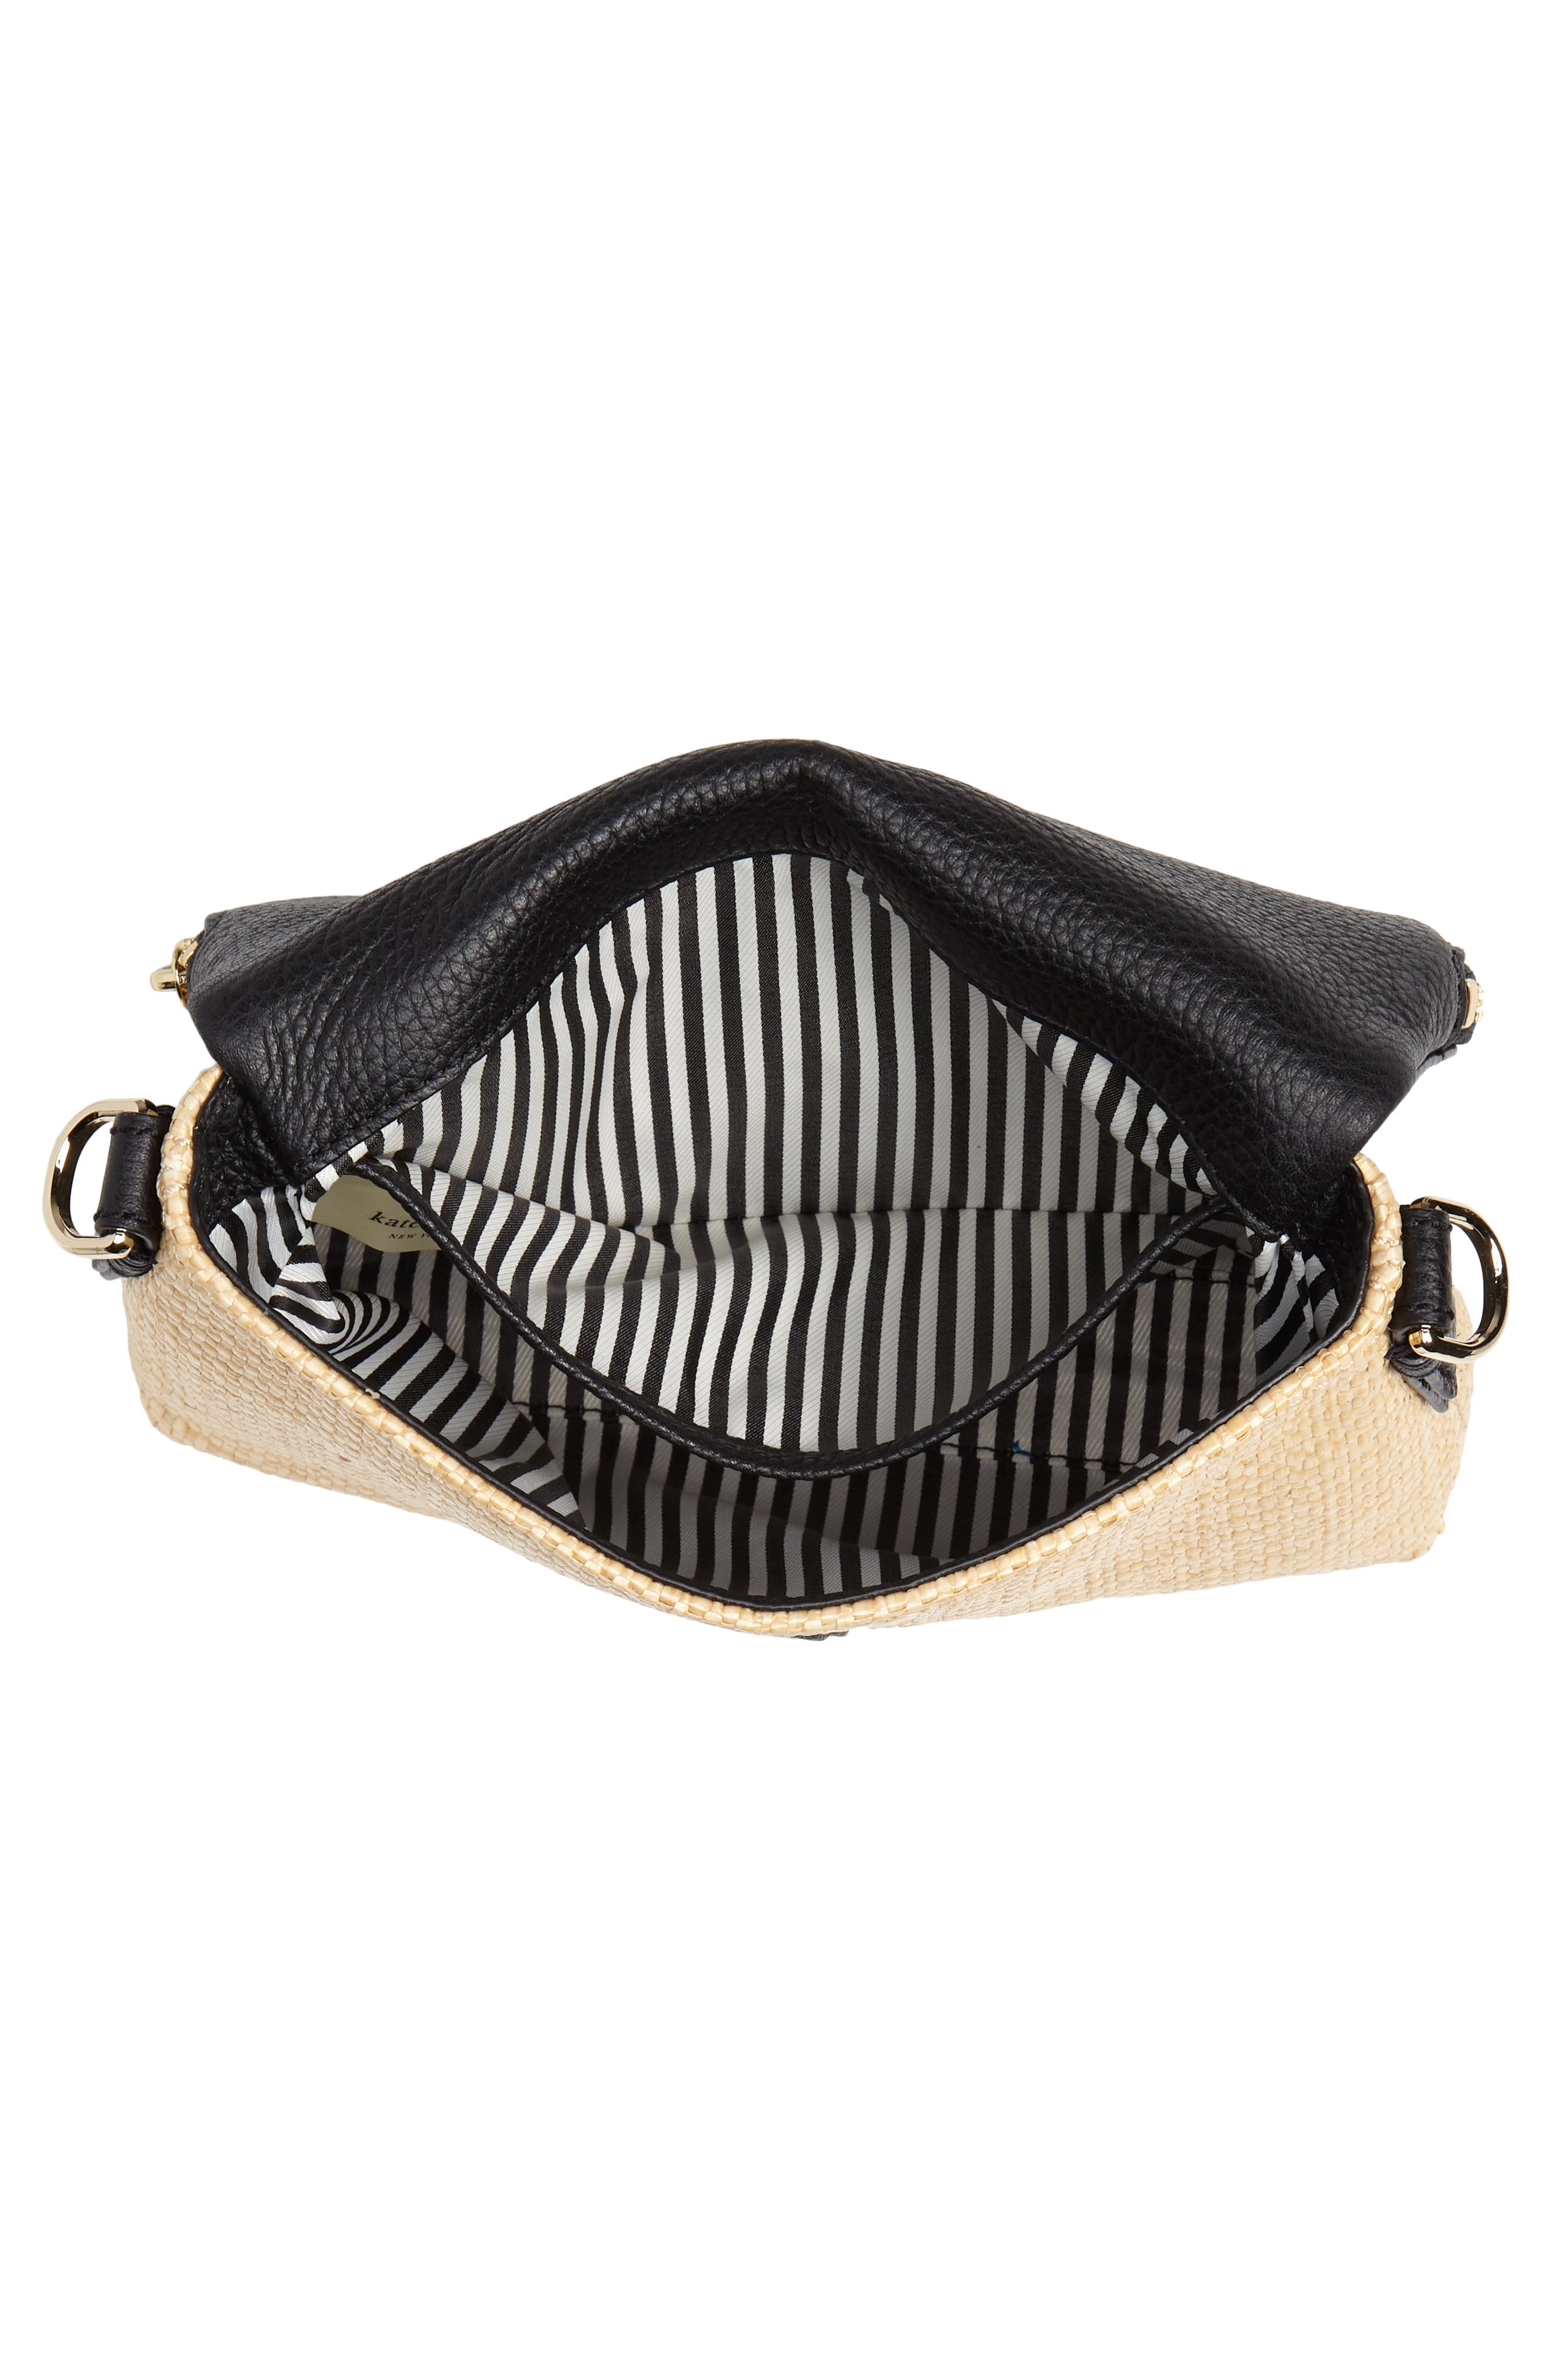 jackson street – harlyn straw & leather crossbody bag,                             Alternate thumbnail 4, color,